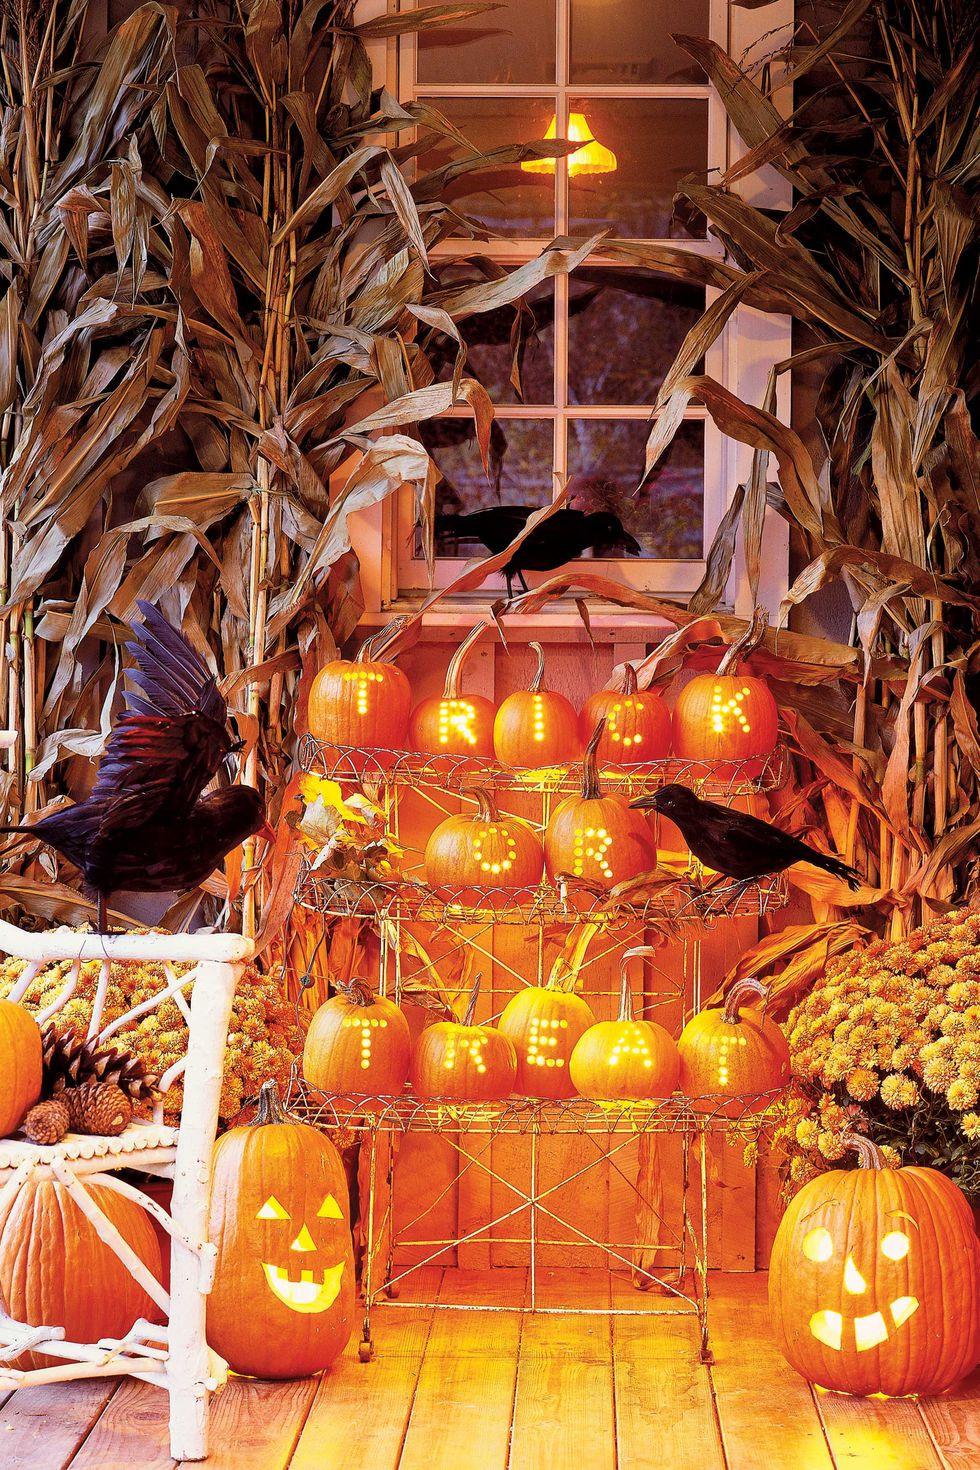 Diy Halloween Party Decoration Ideas  15 Festive DIY Halloween Party Decorations You Must Craft